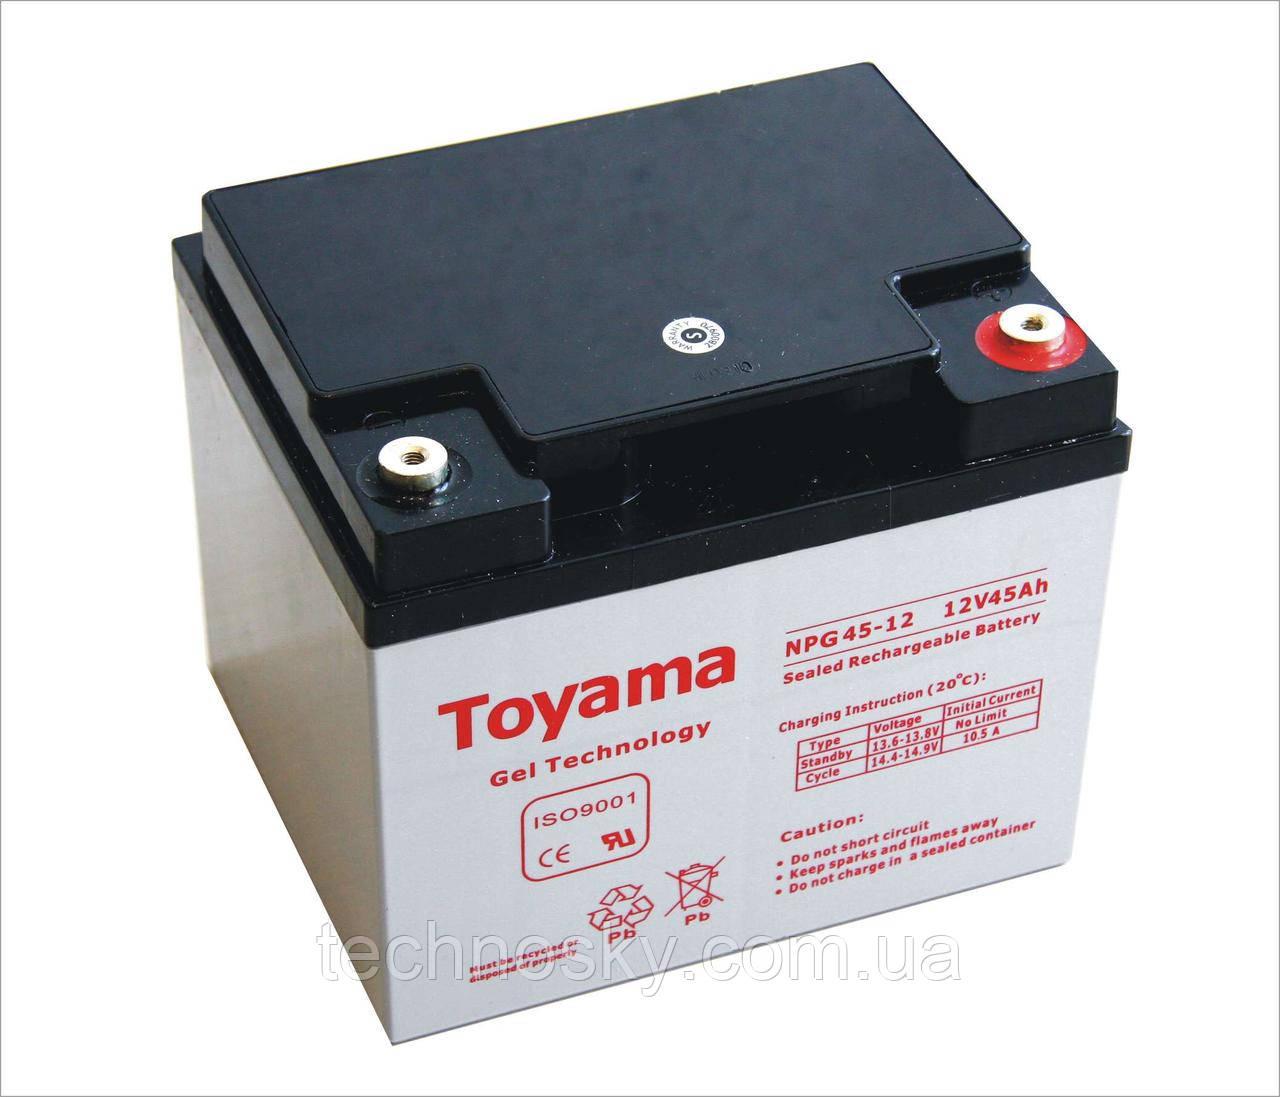 Гелевая батарея Toyama NPG 45-12 (12В , 45Ач)